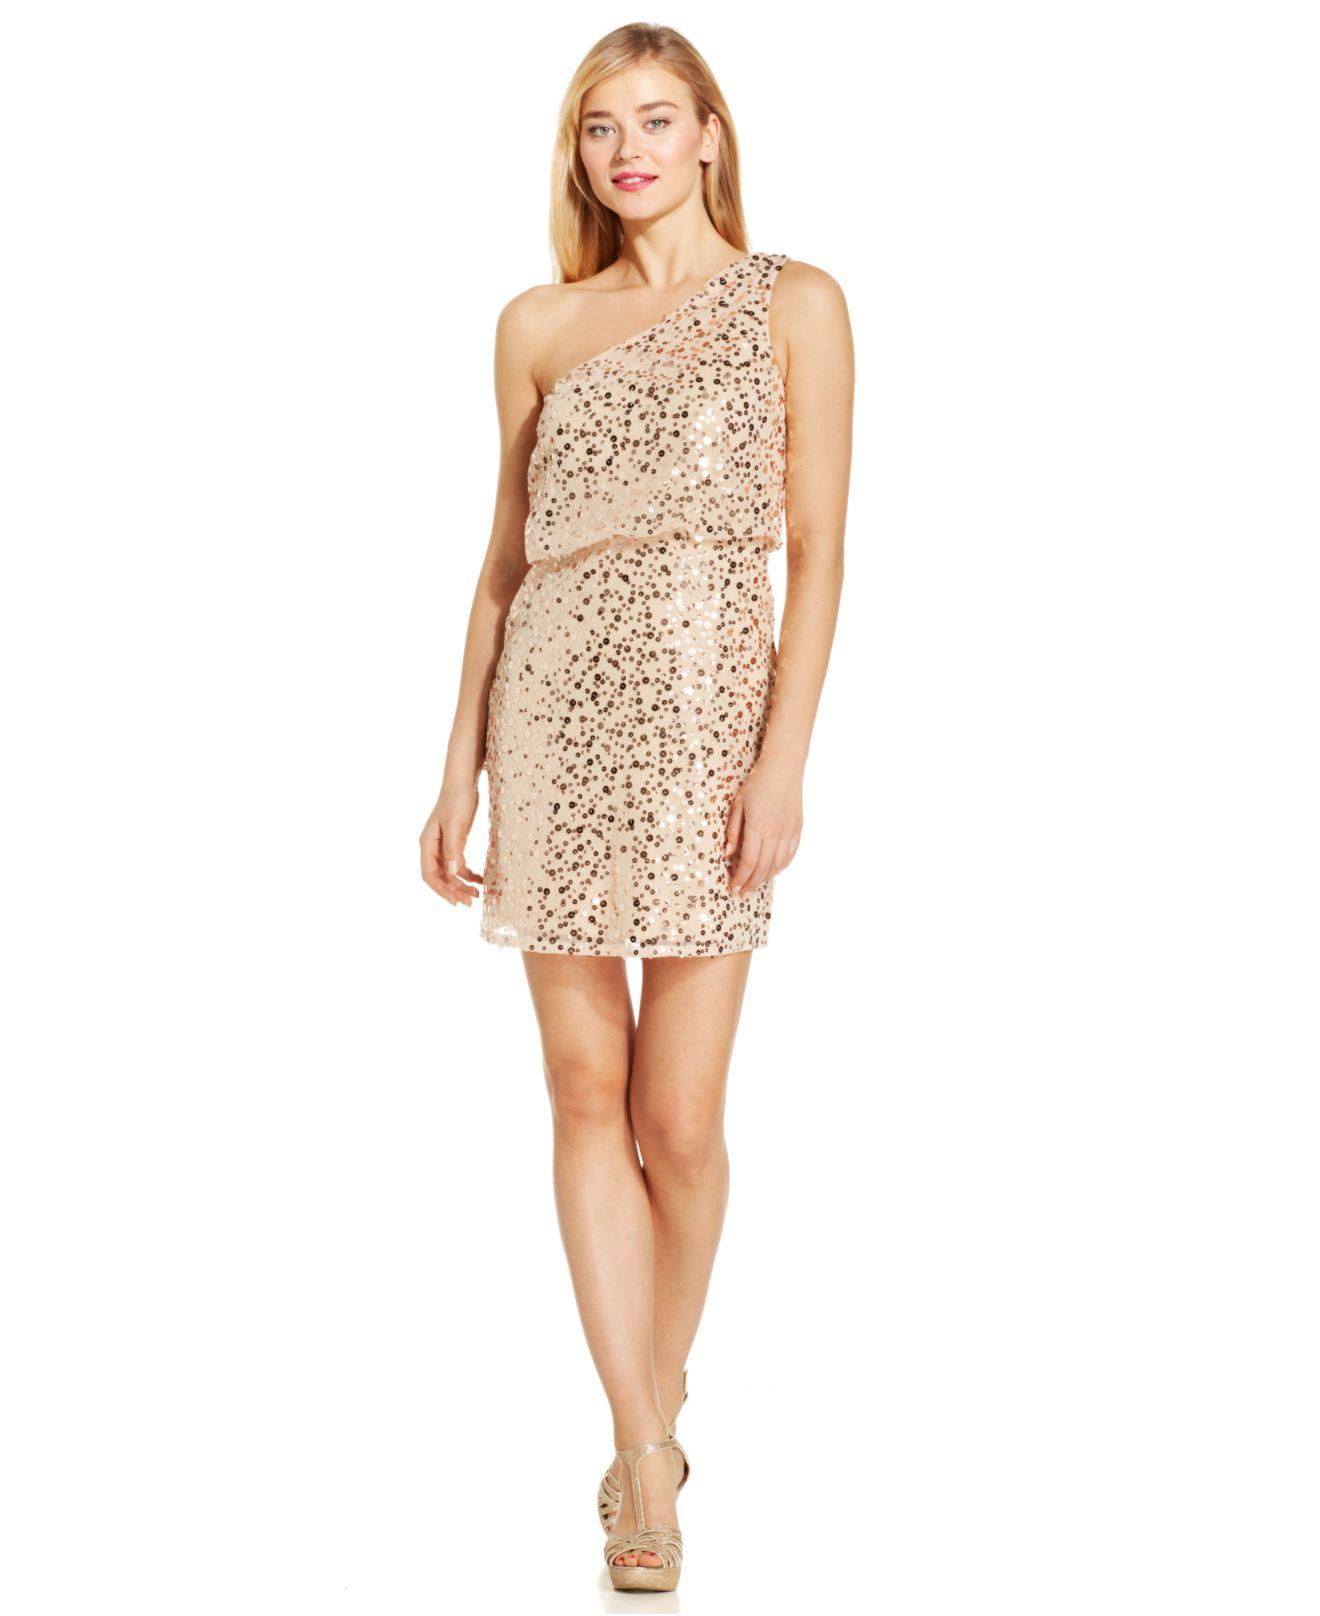 Js boutique One-Shoulder Sequin Blouson Dress in Metallic  Lyst